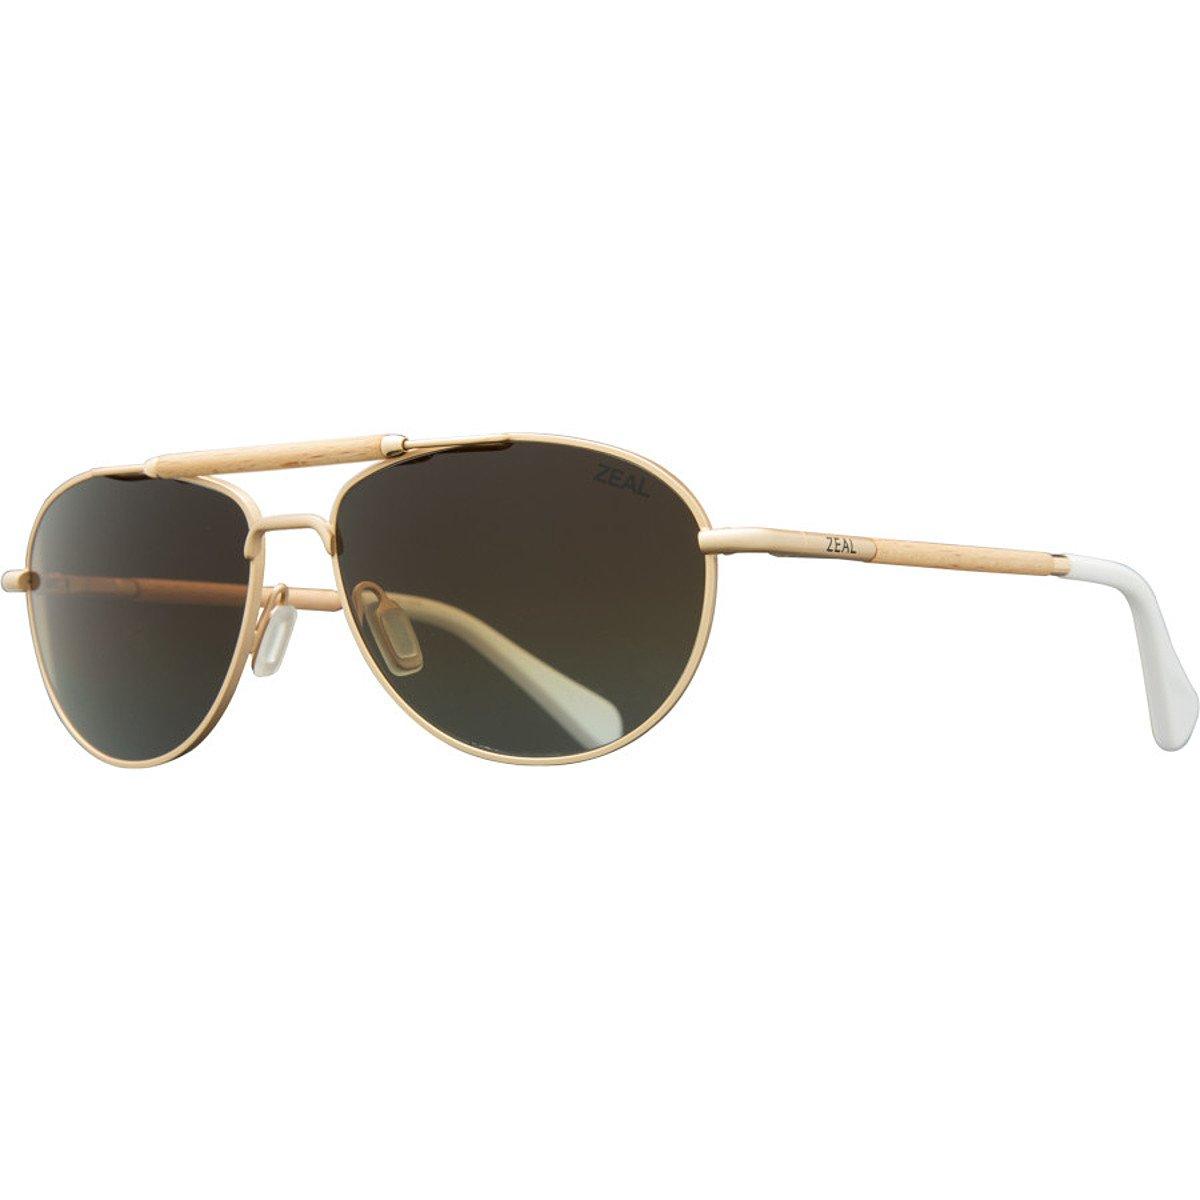 Zeal Fairmont Sunglasses